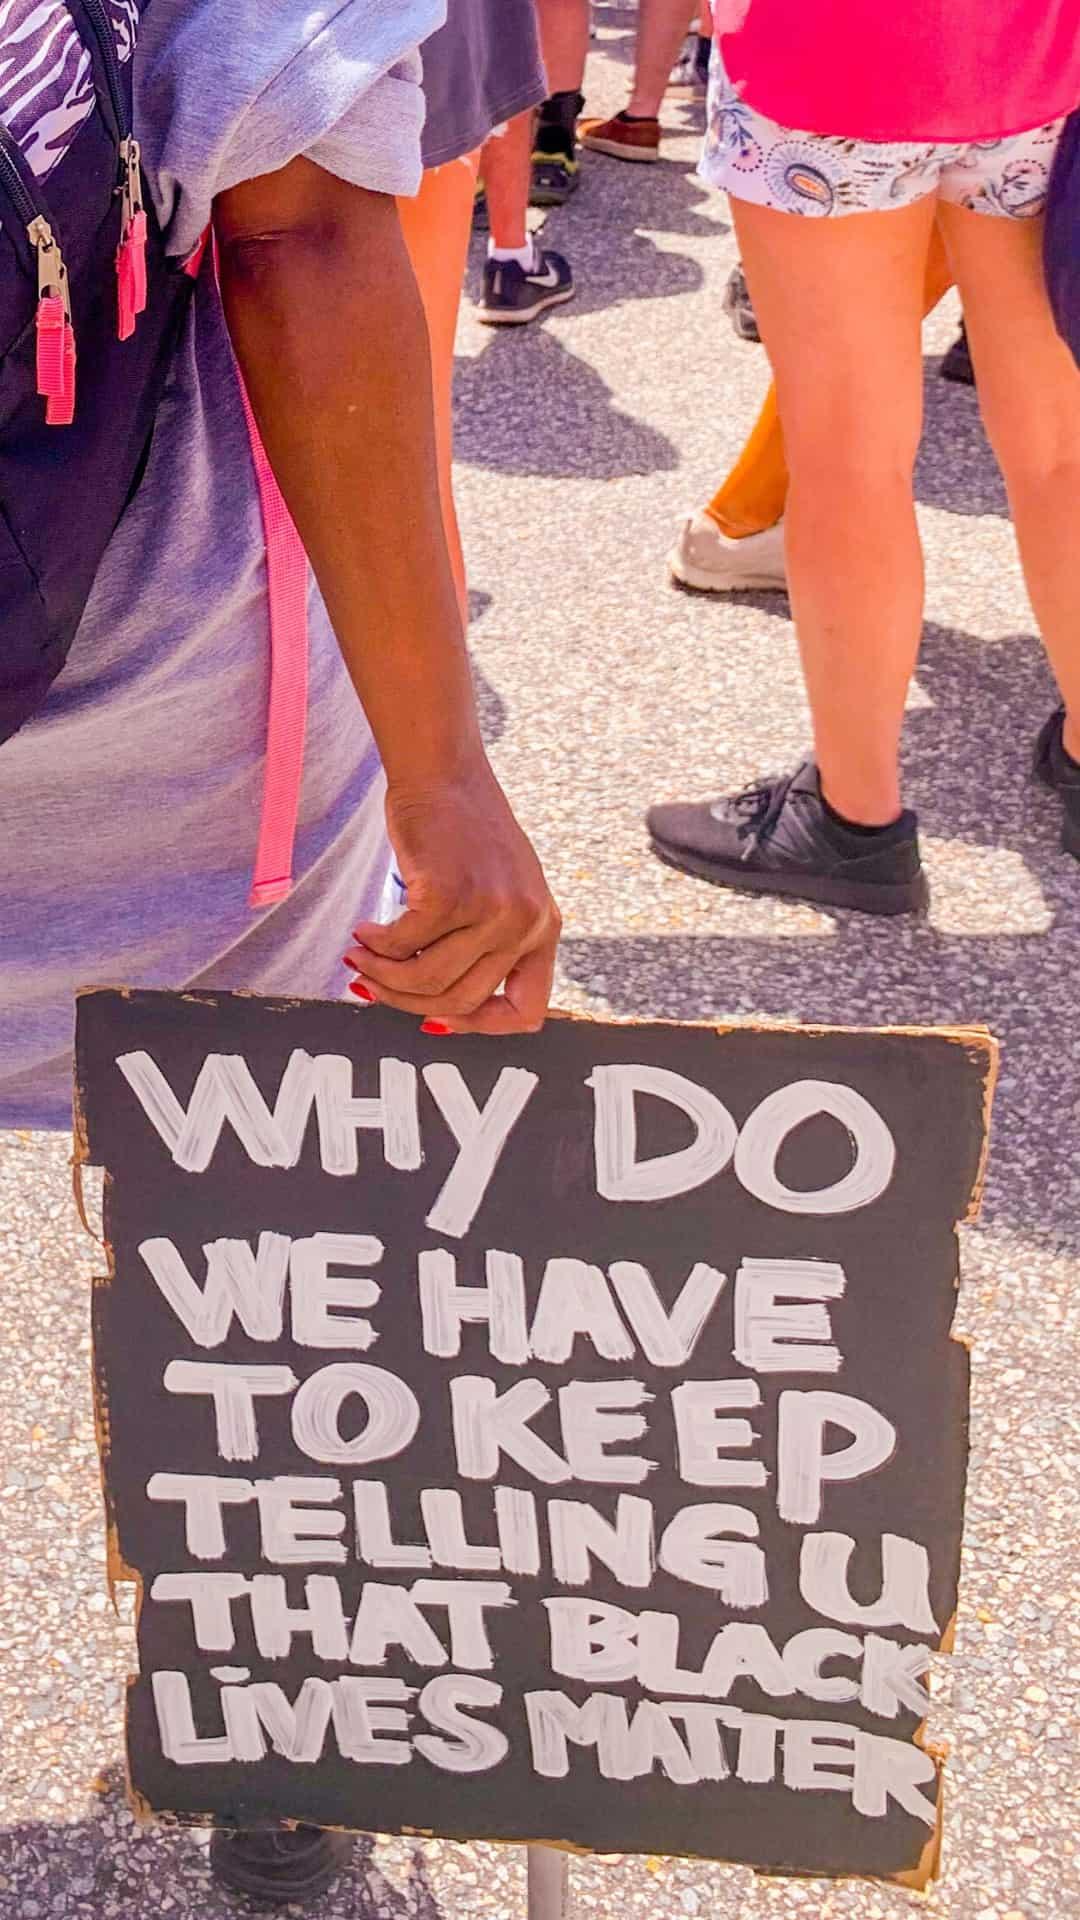 painted Black Lives Matter protest sign